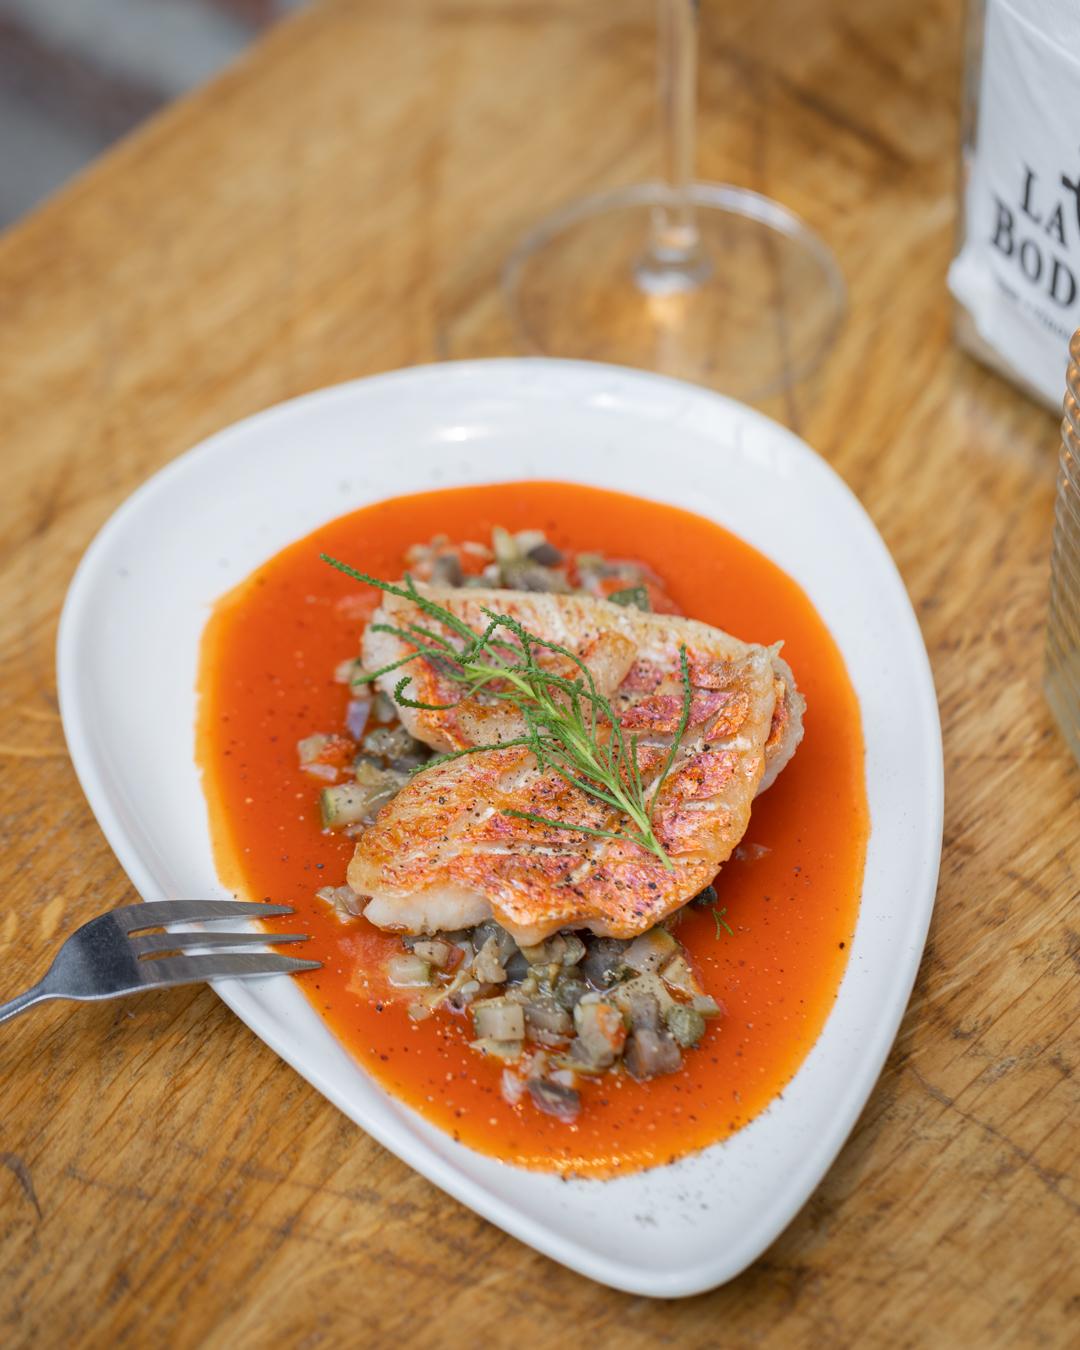 La Bodega | Tapas Restaurant Maastricht